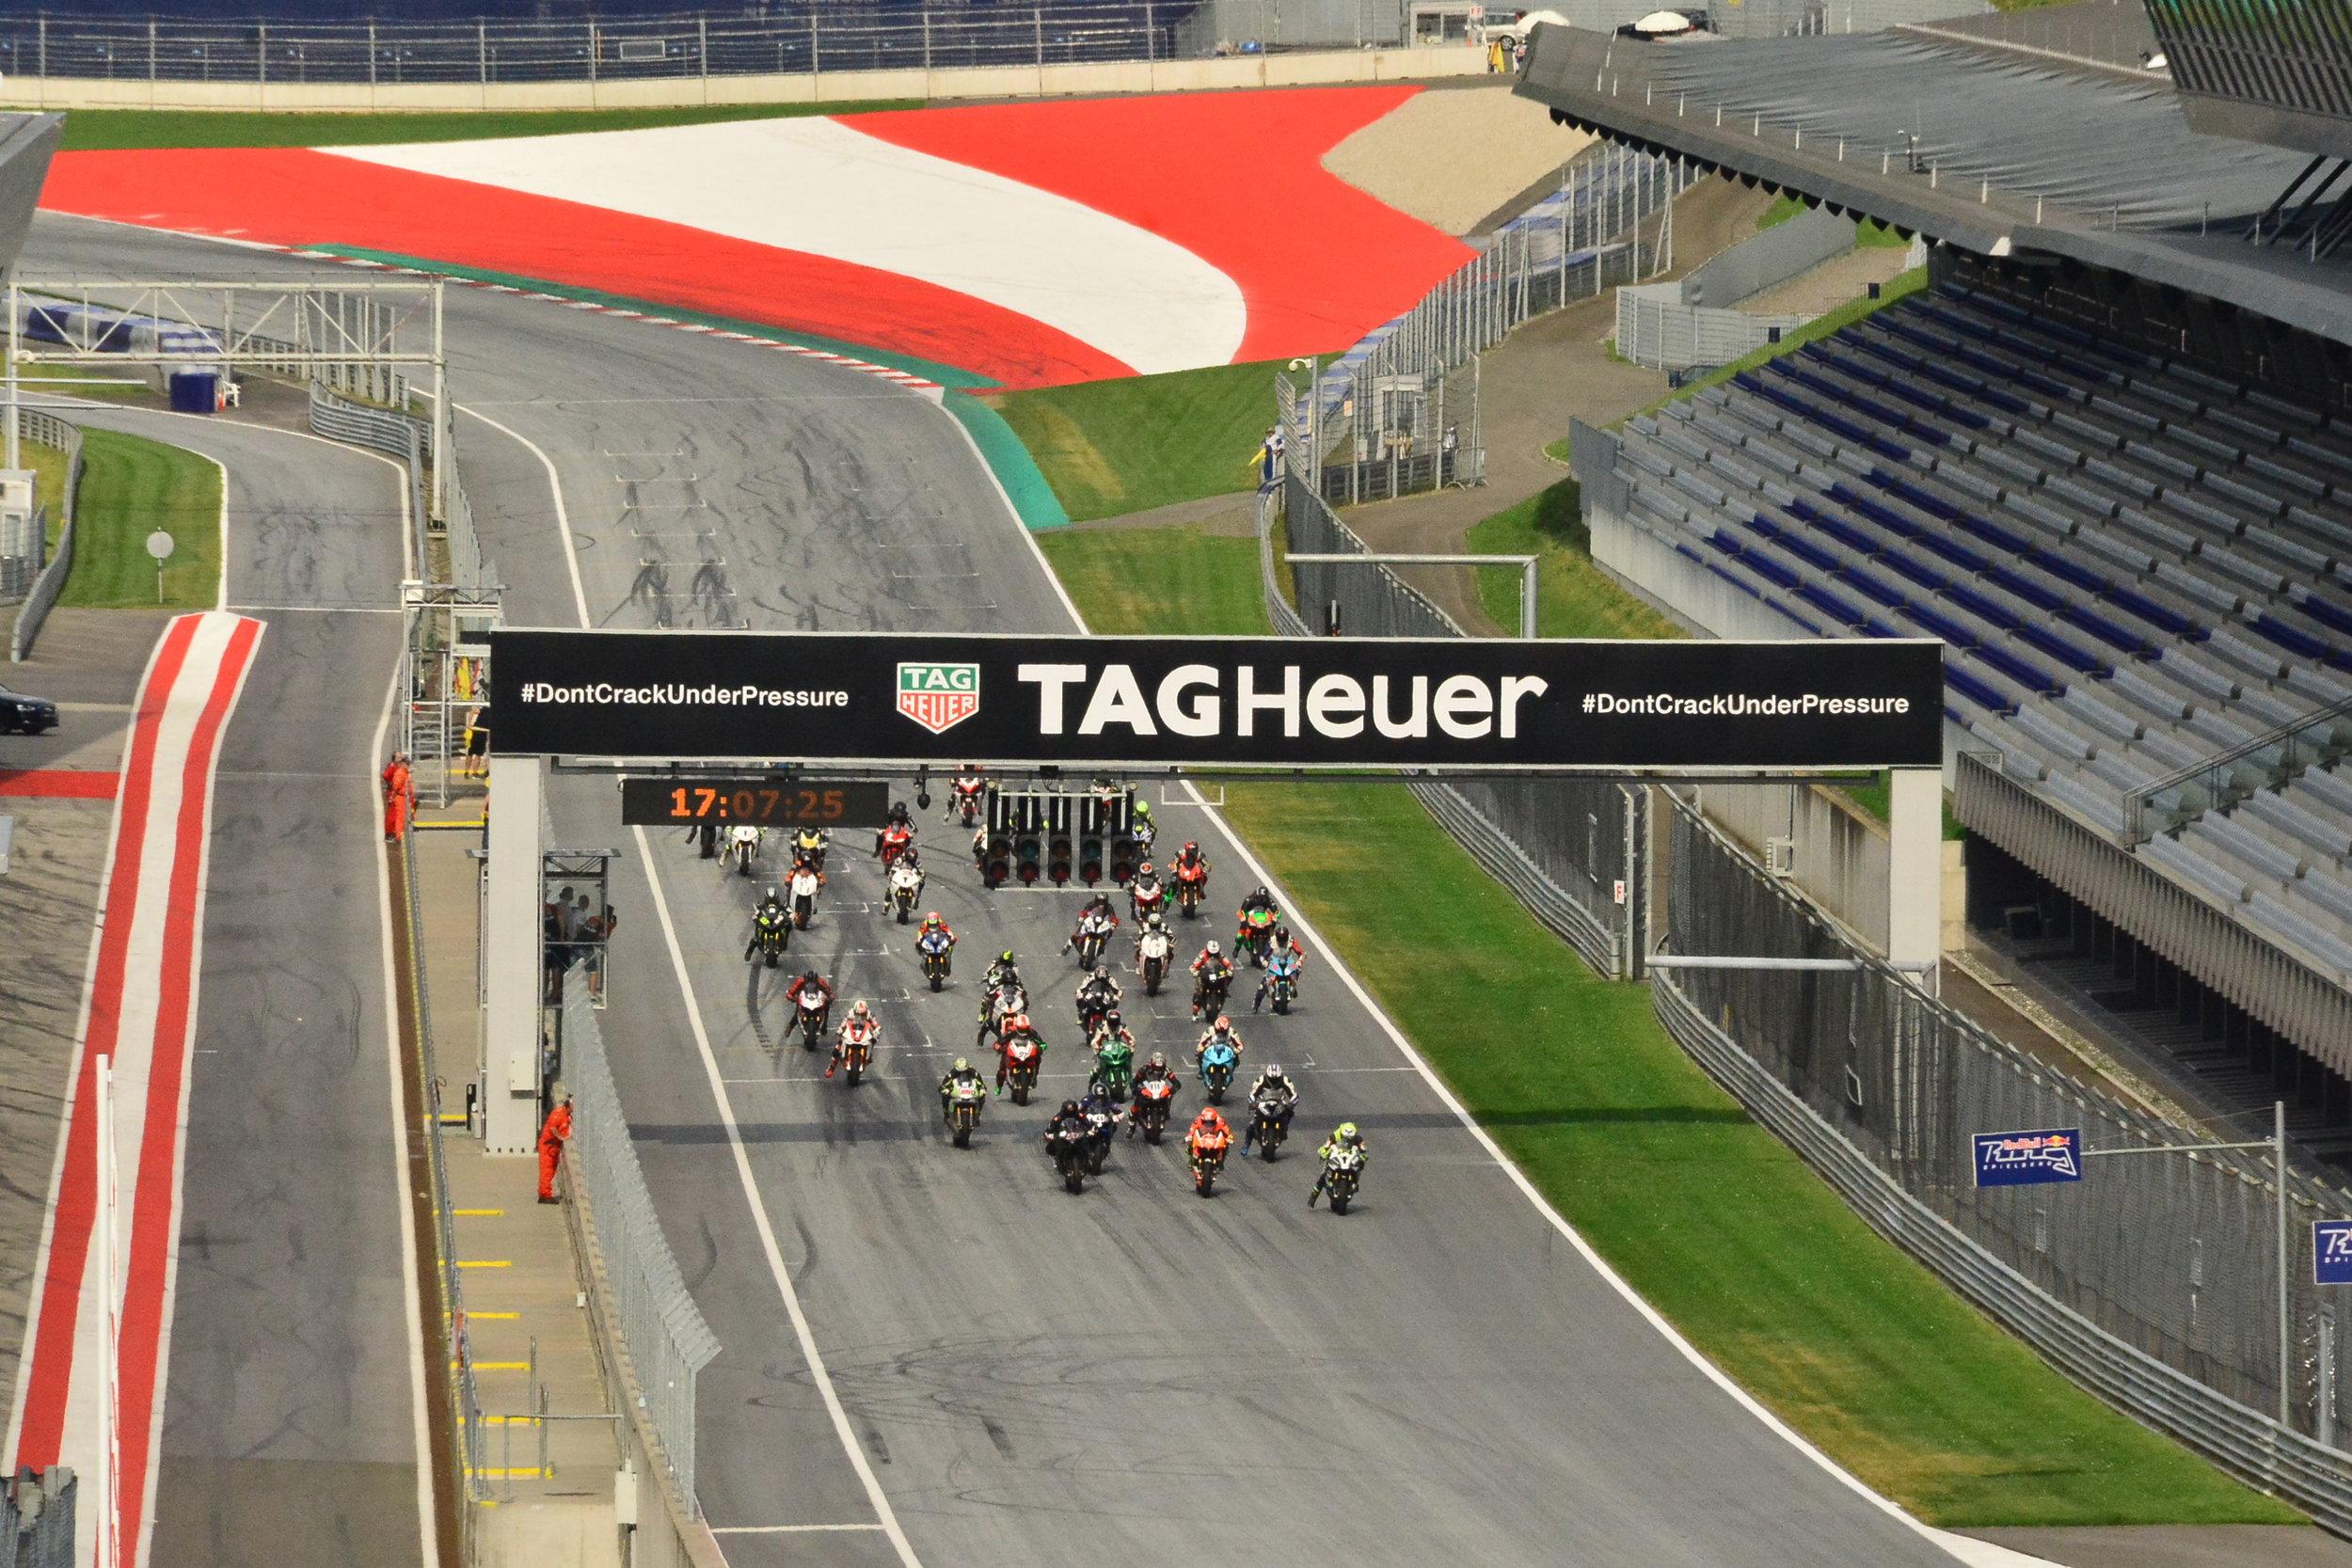 Race_1 (2).JPG